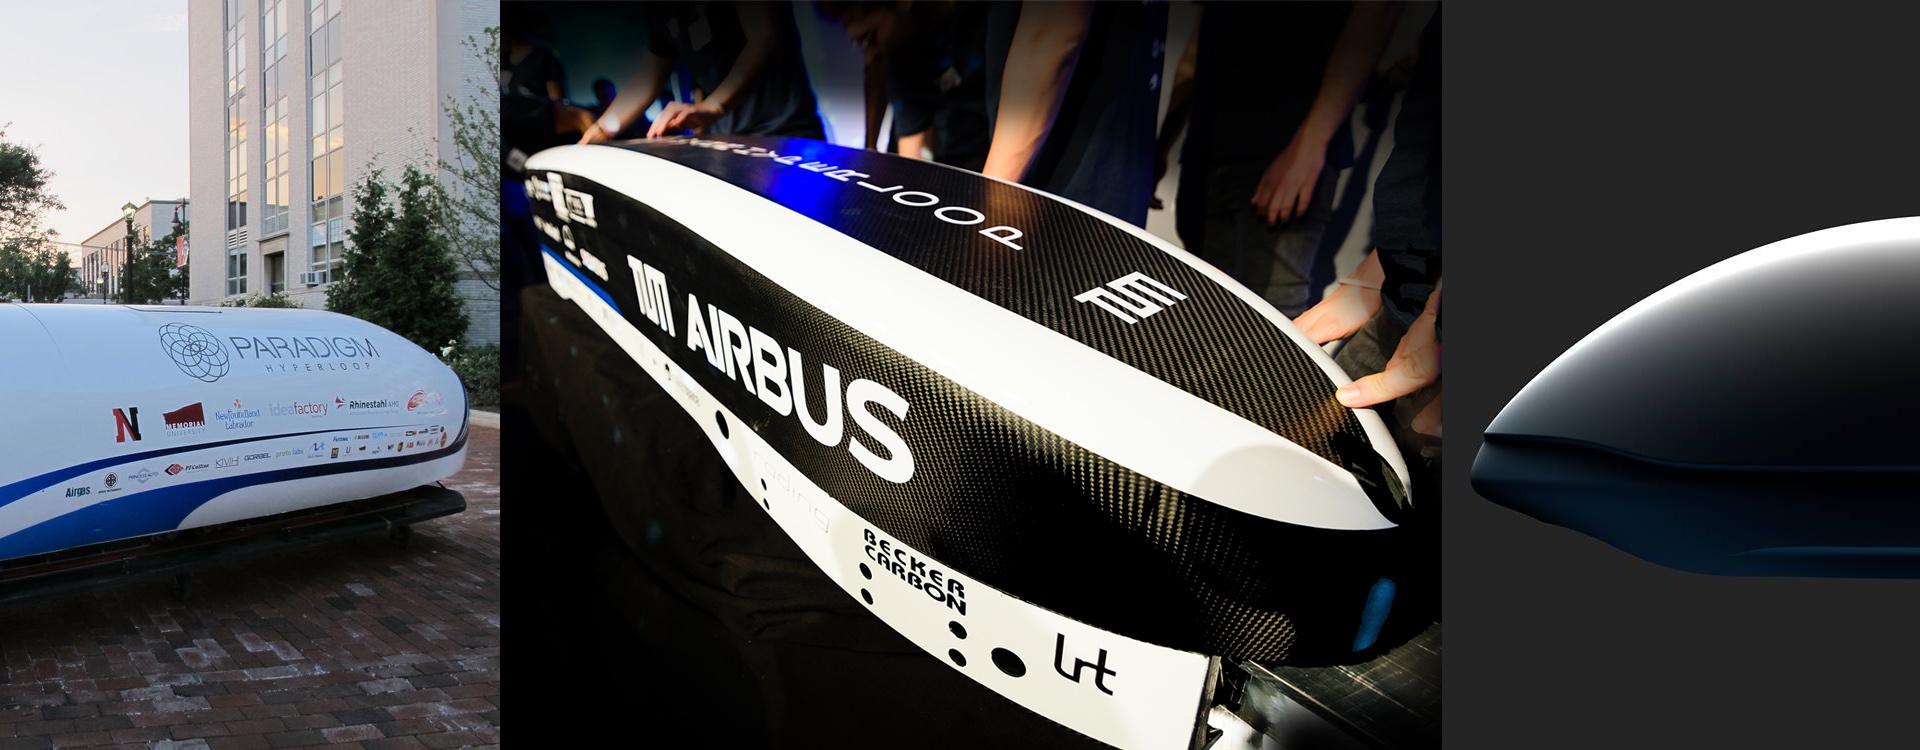 Hyperloop-top-speed-Competition-2-musk